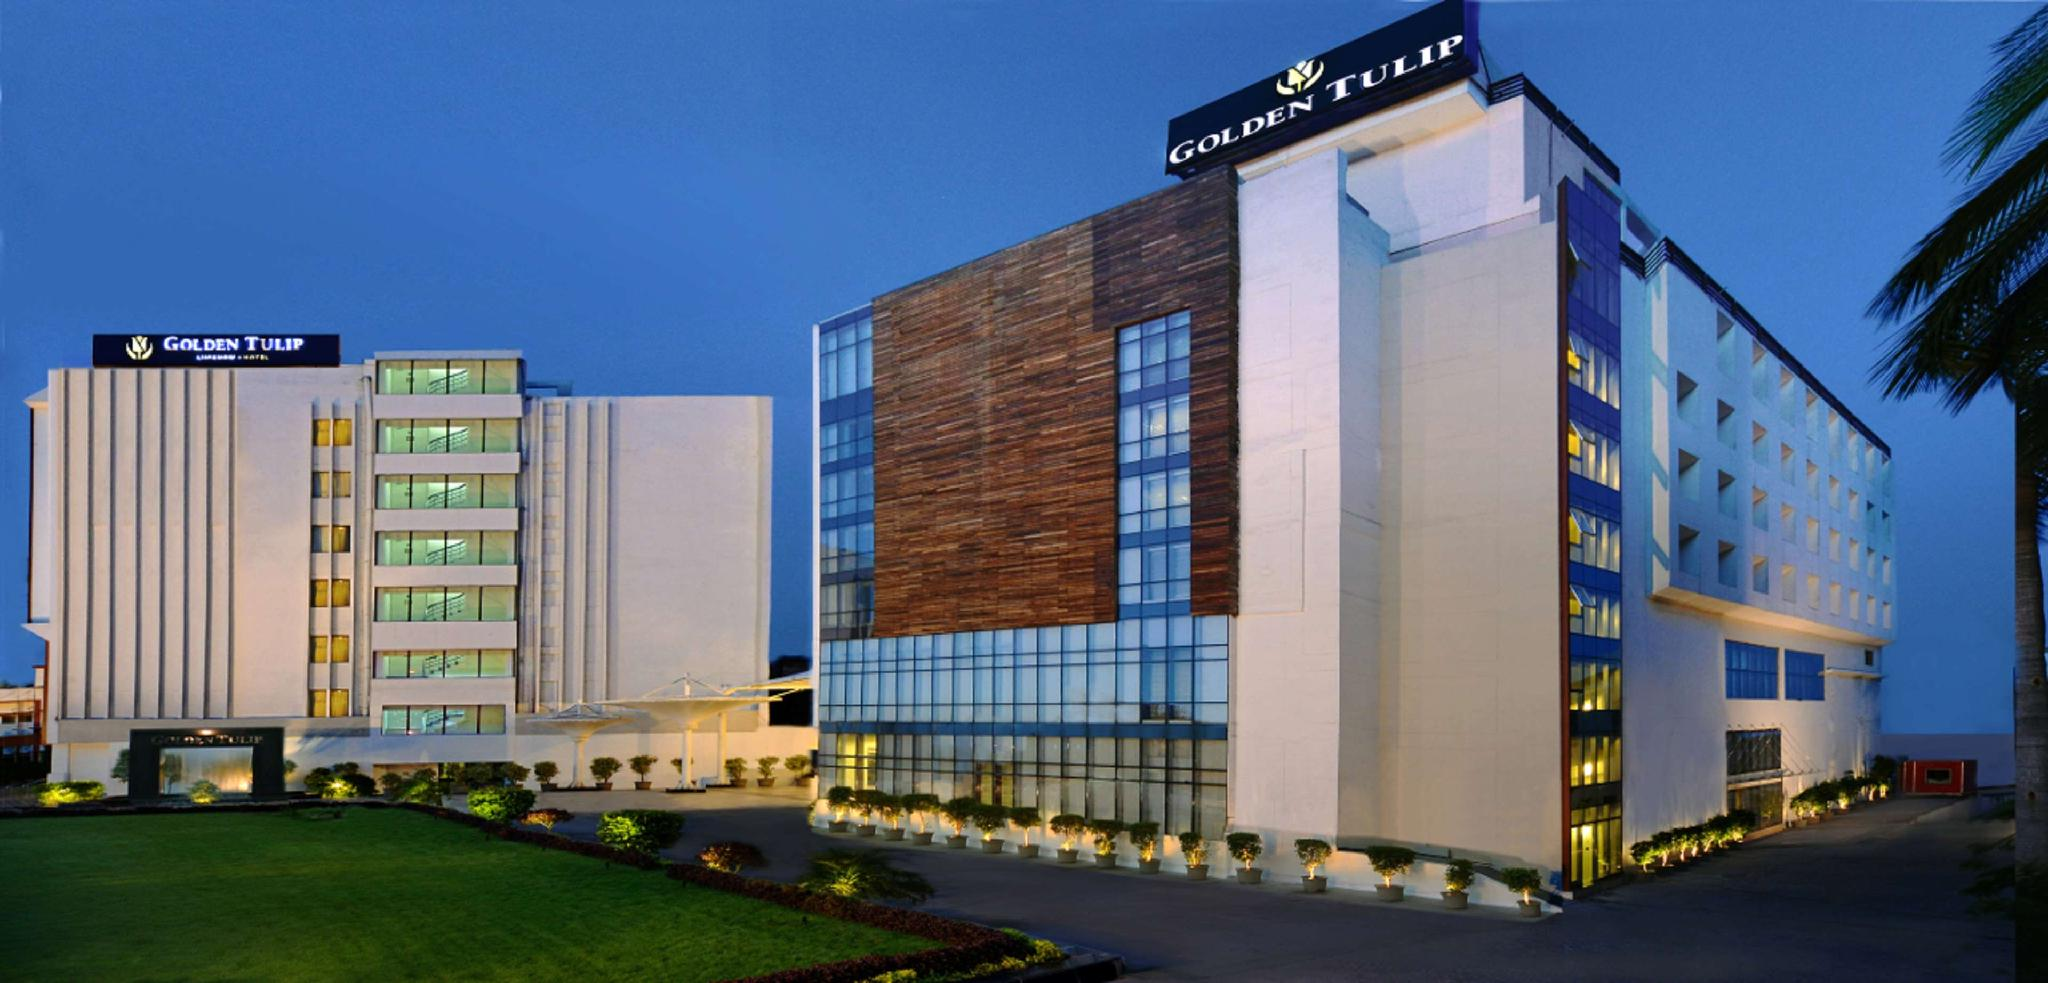 Golden Tulip Mid-Range Hotel in Lucknow